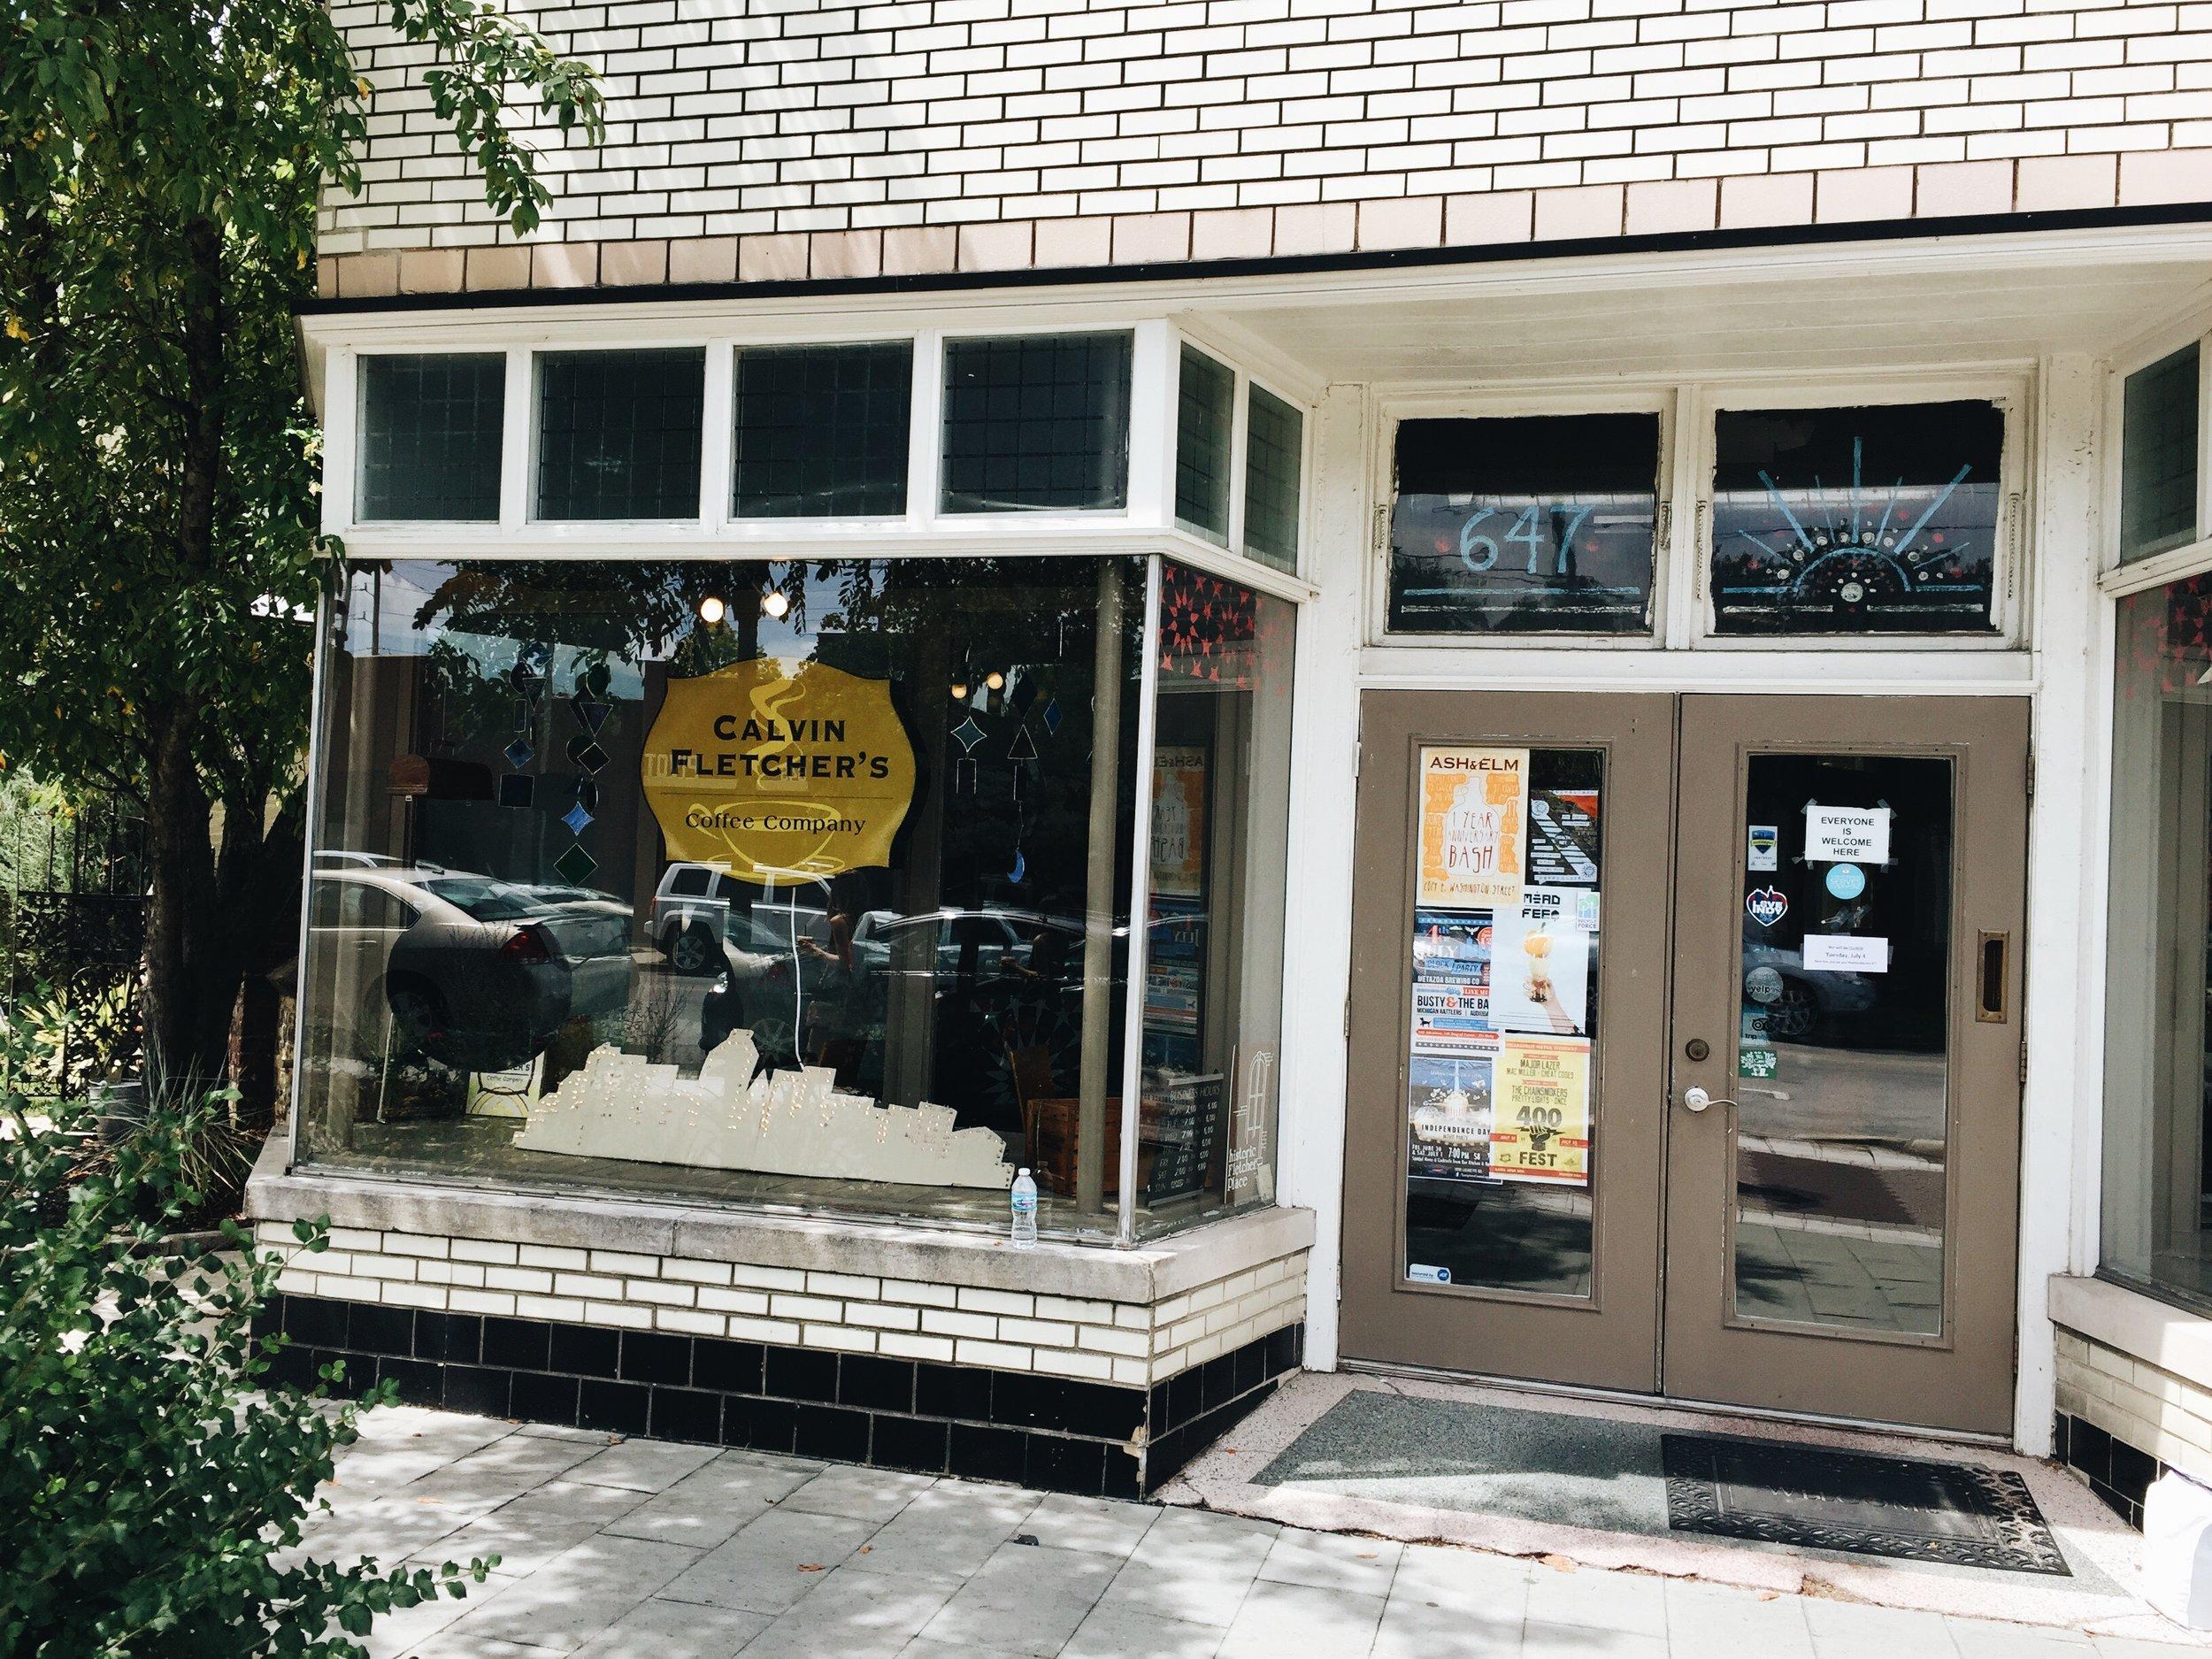 Calvin Fletcher's Coffee Company  -647 Virginia Ave, Indianapolis, IN 46203